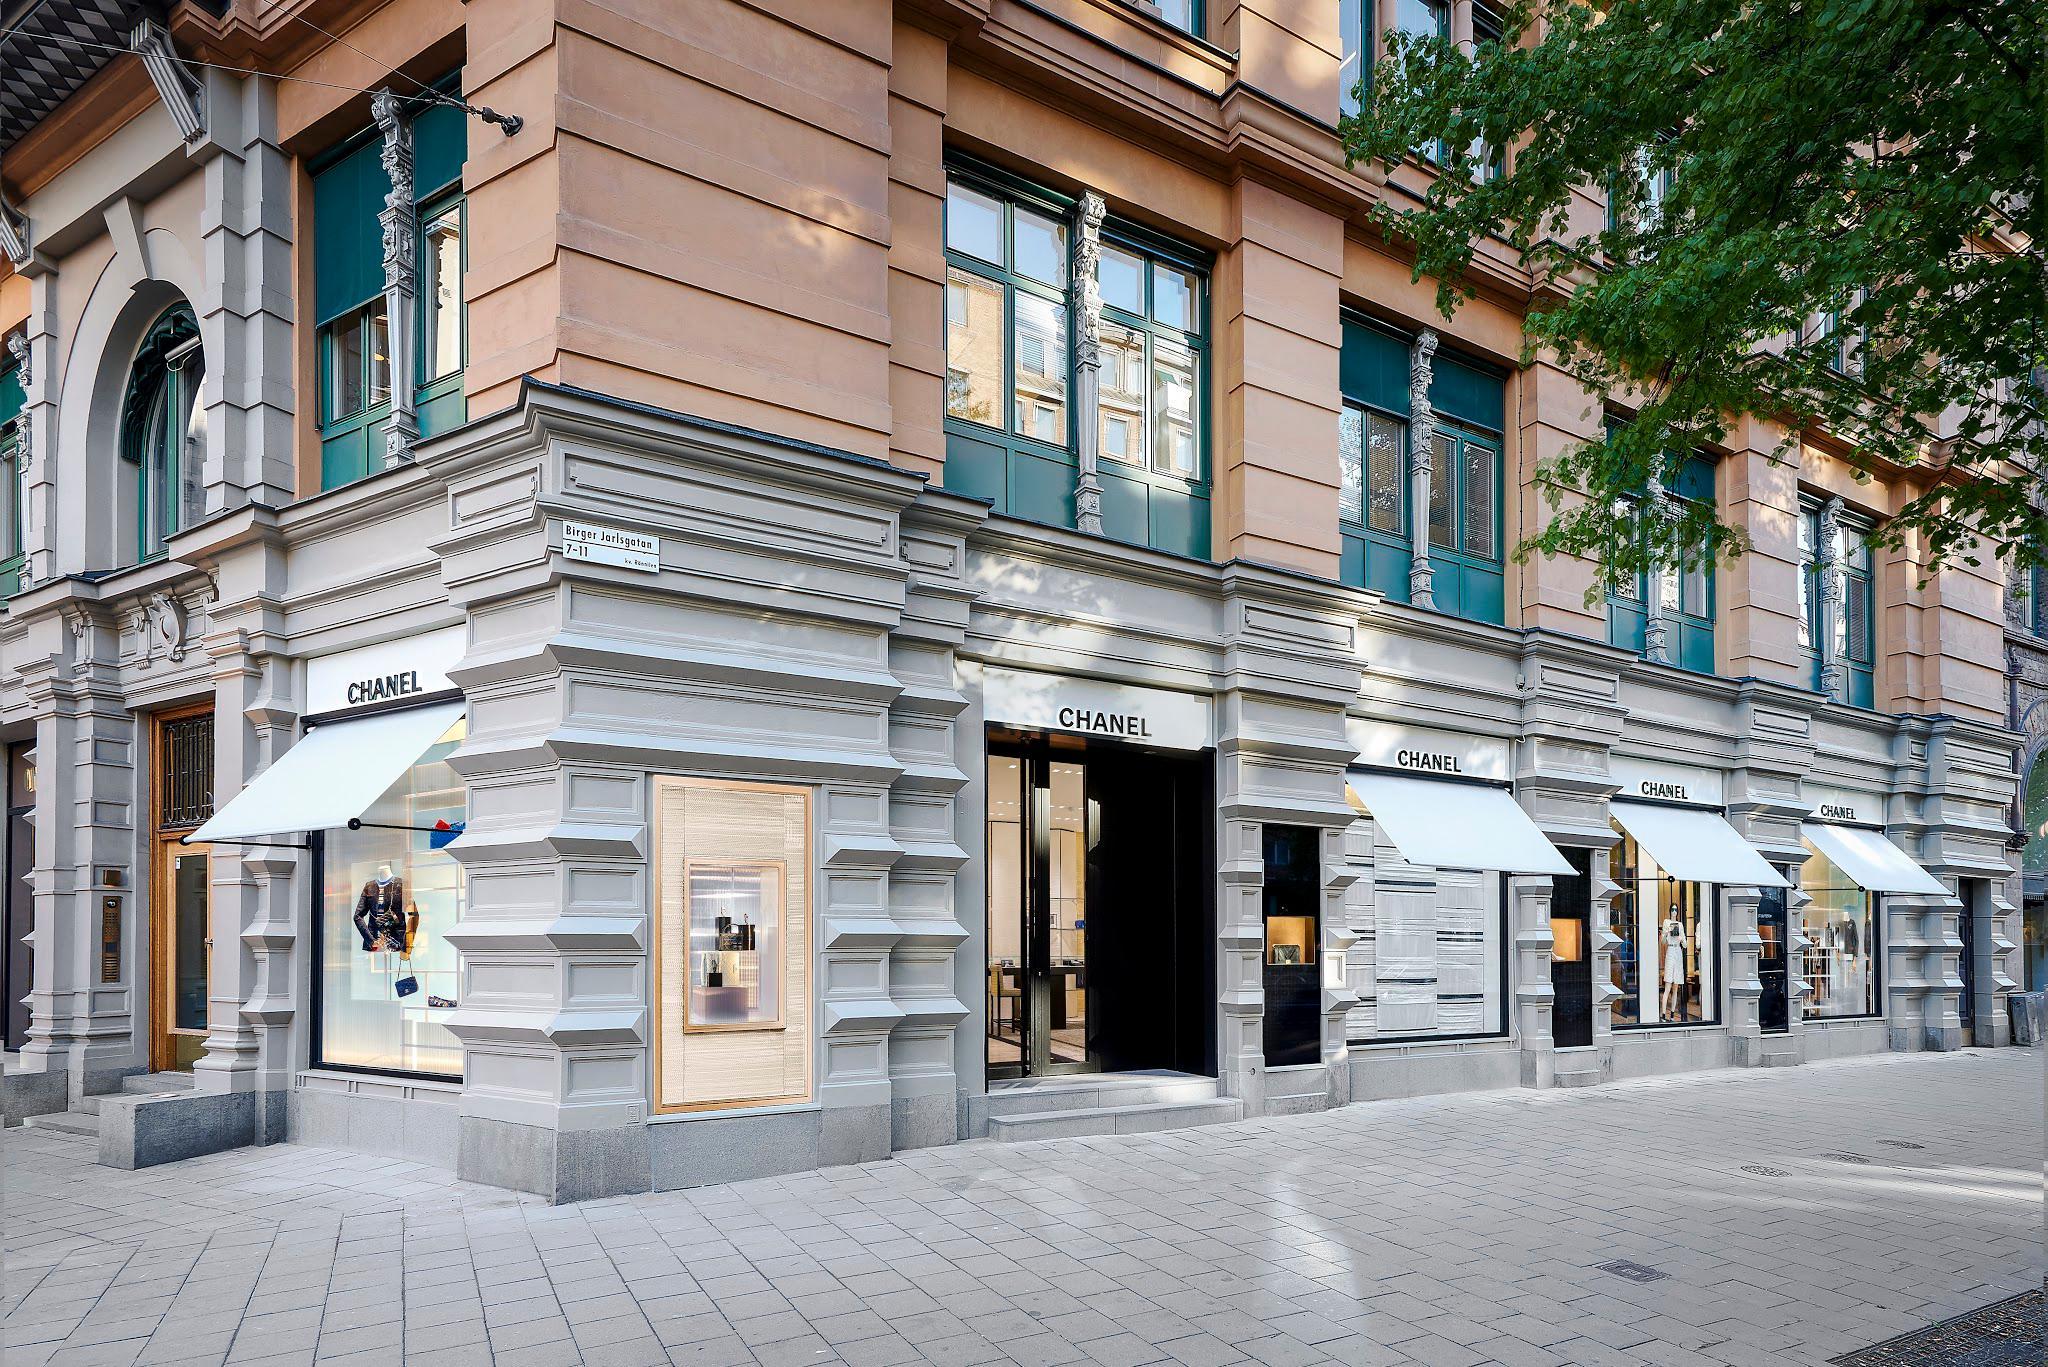 Chanel Stockholm Öppettider